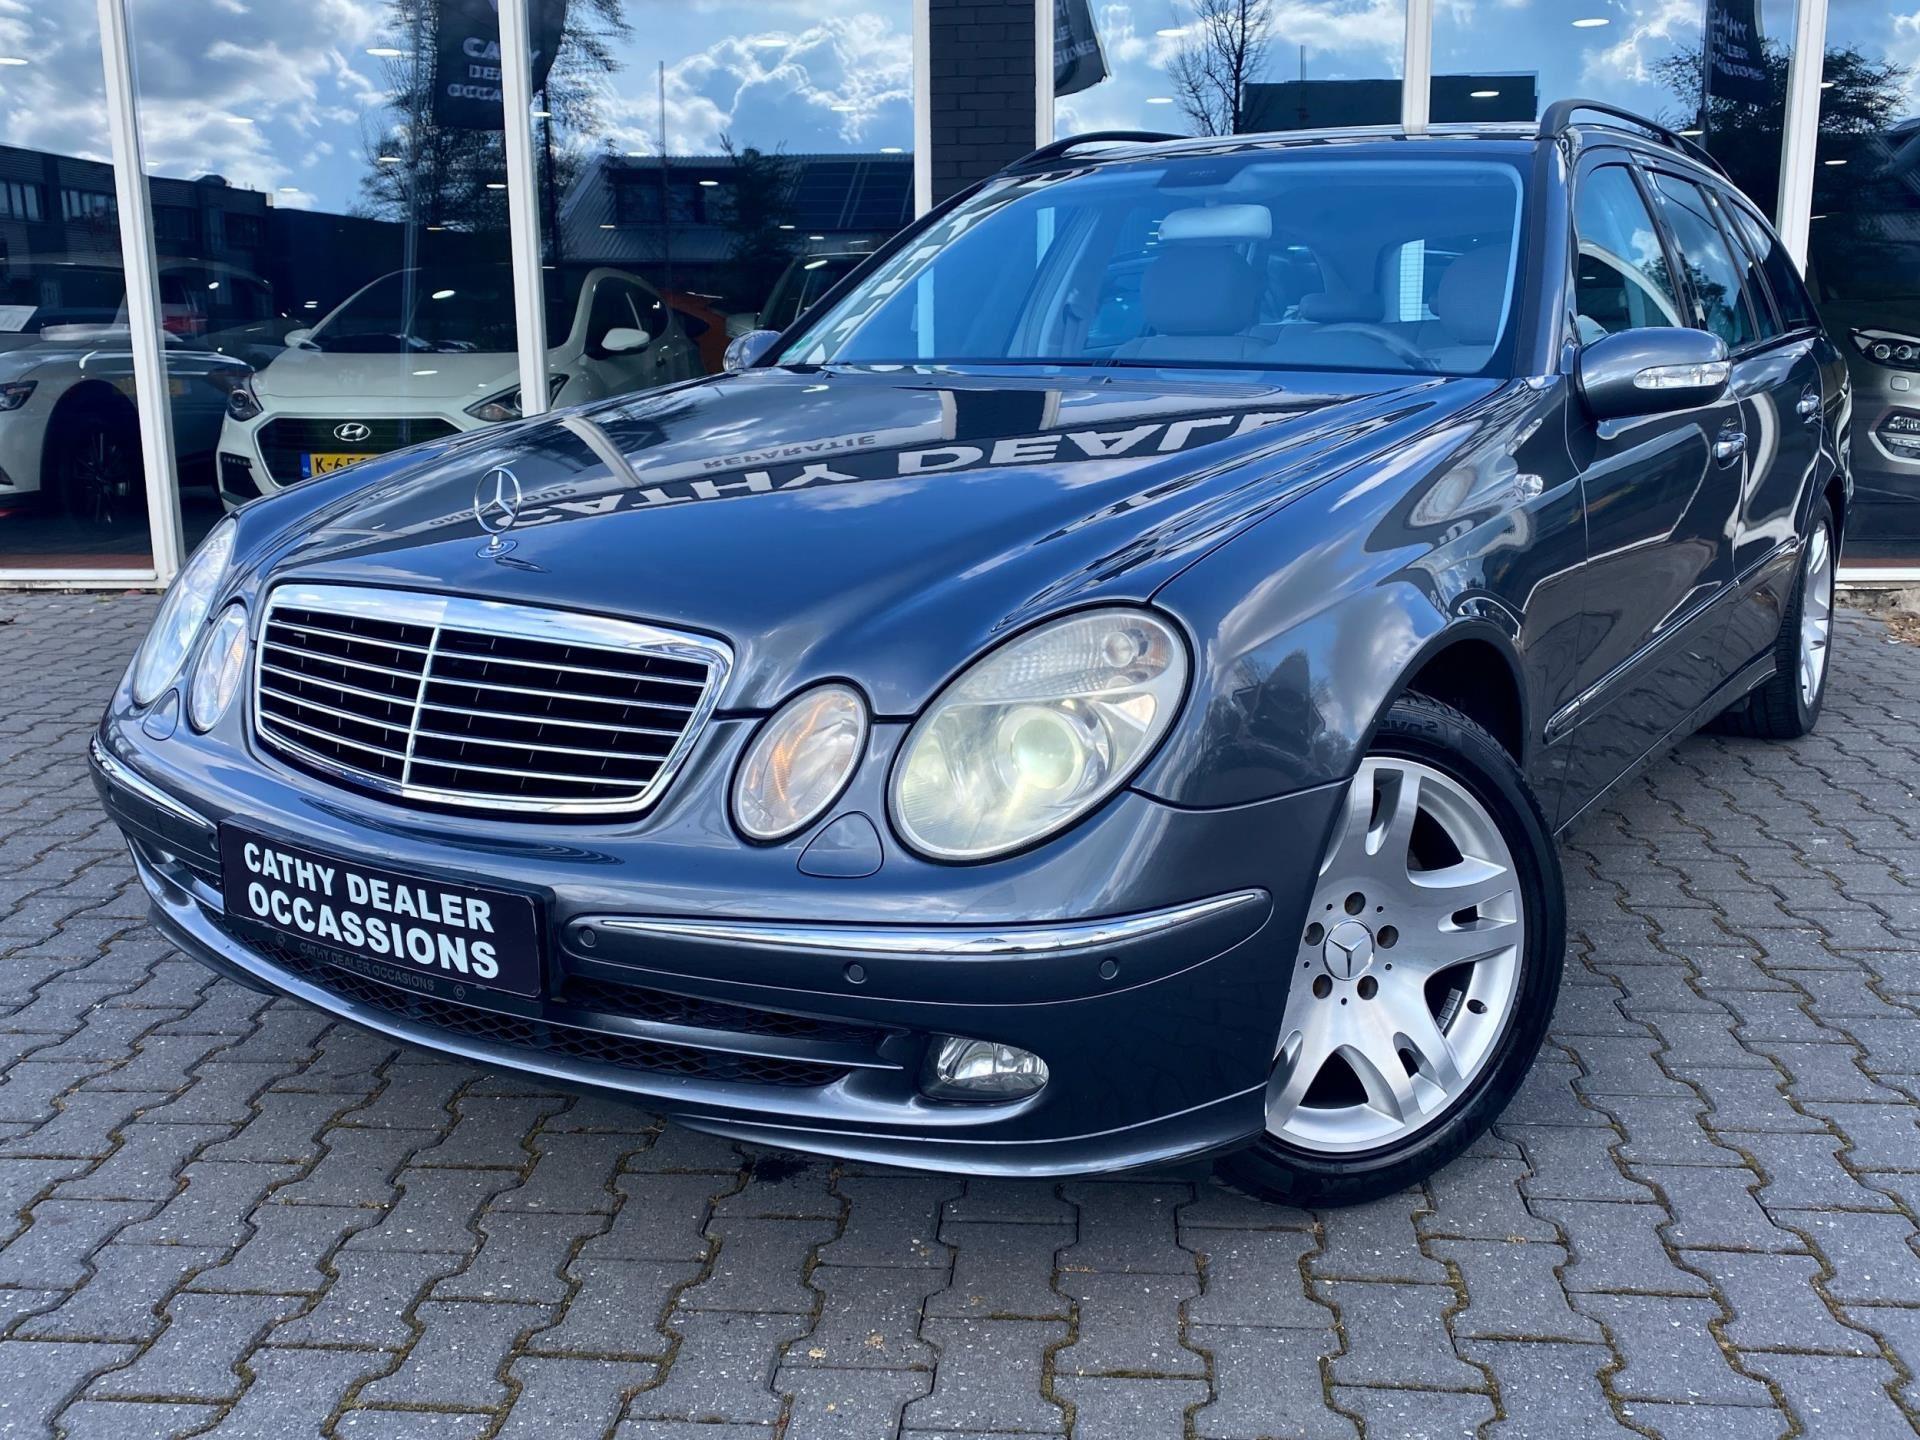 Mercedes-Benz E-klasse Estate occasion - Cathy Dealer Occasions